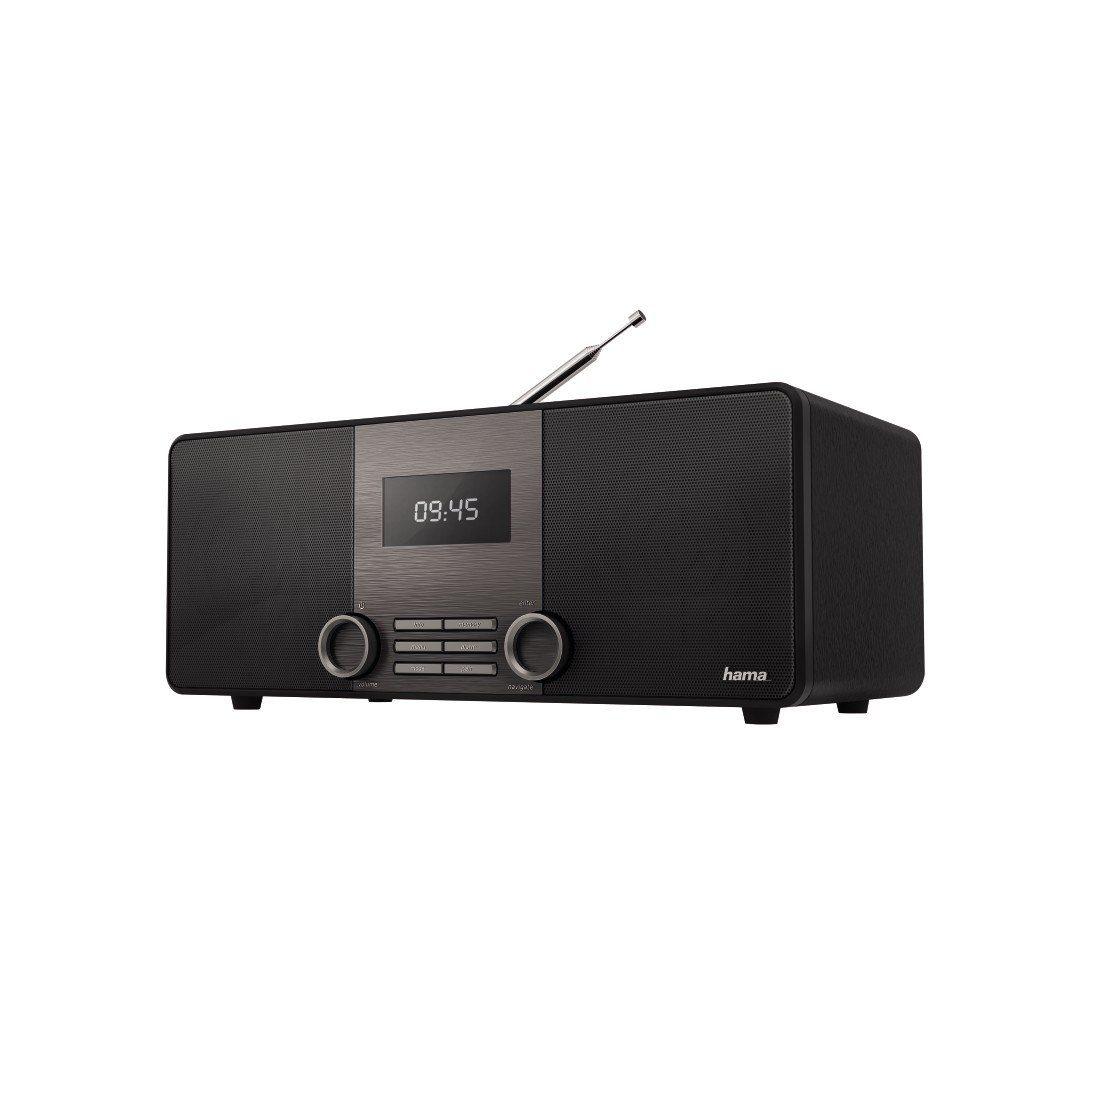 Hama Hama Digitalradio, DAB/DAB+/FM/Bluetooth/Streaming/Aux »Stereo, Radiowecker DR1510BT«